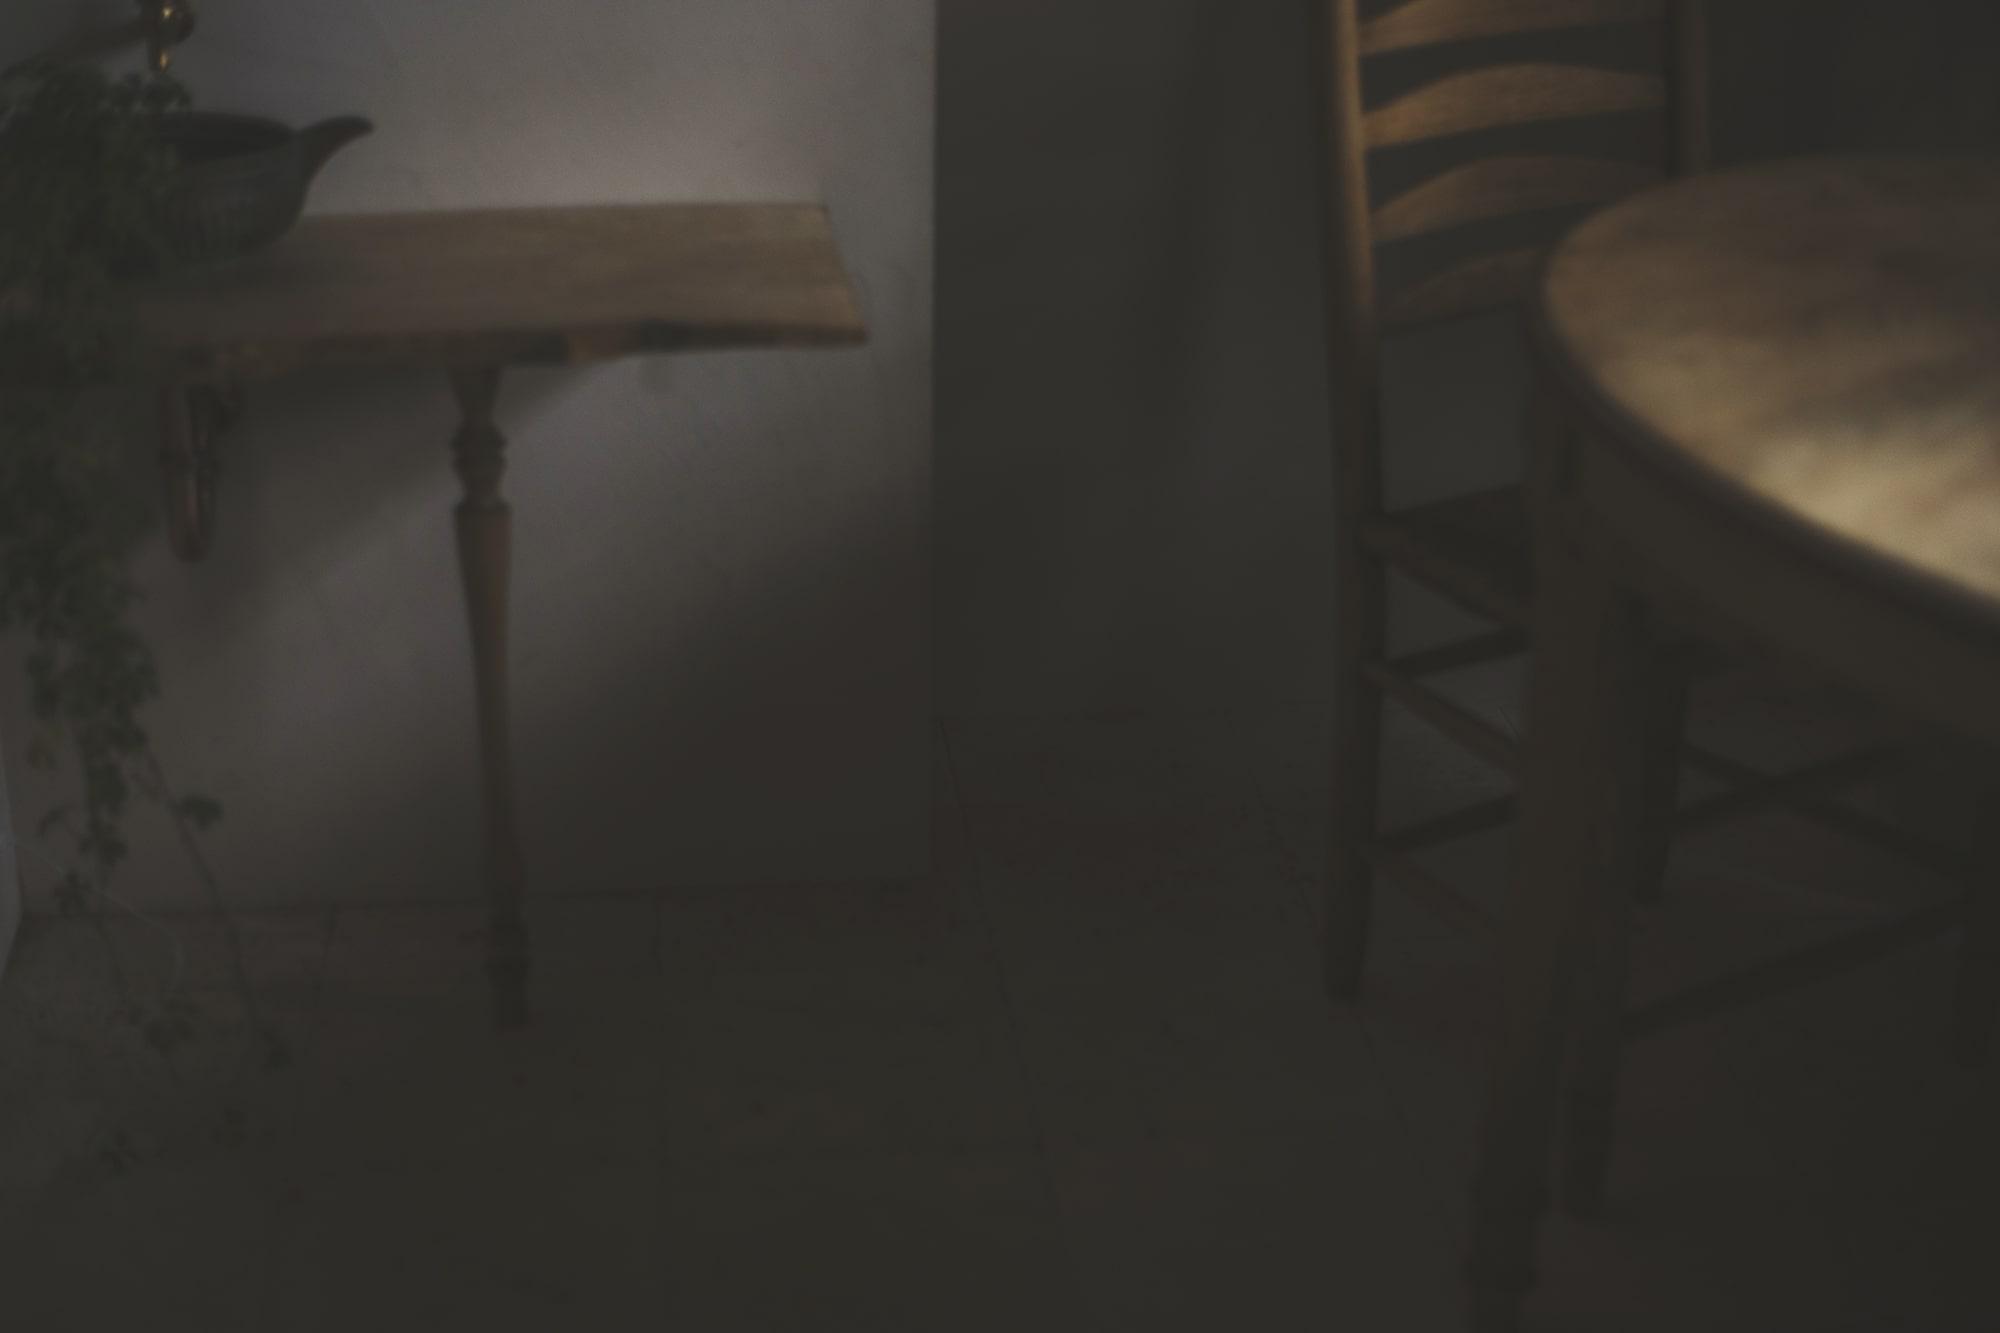 Wooden furniture in dark tone room